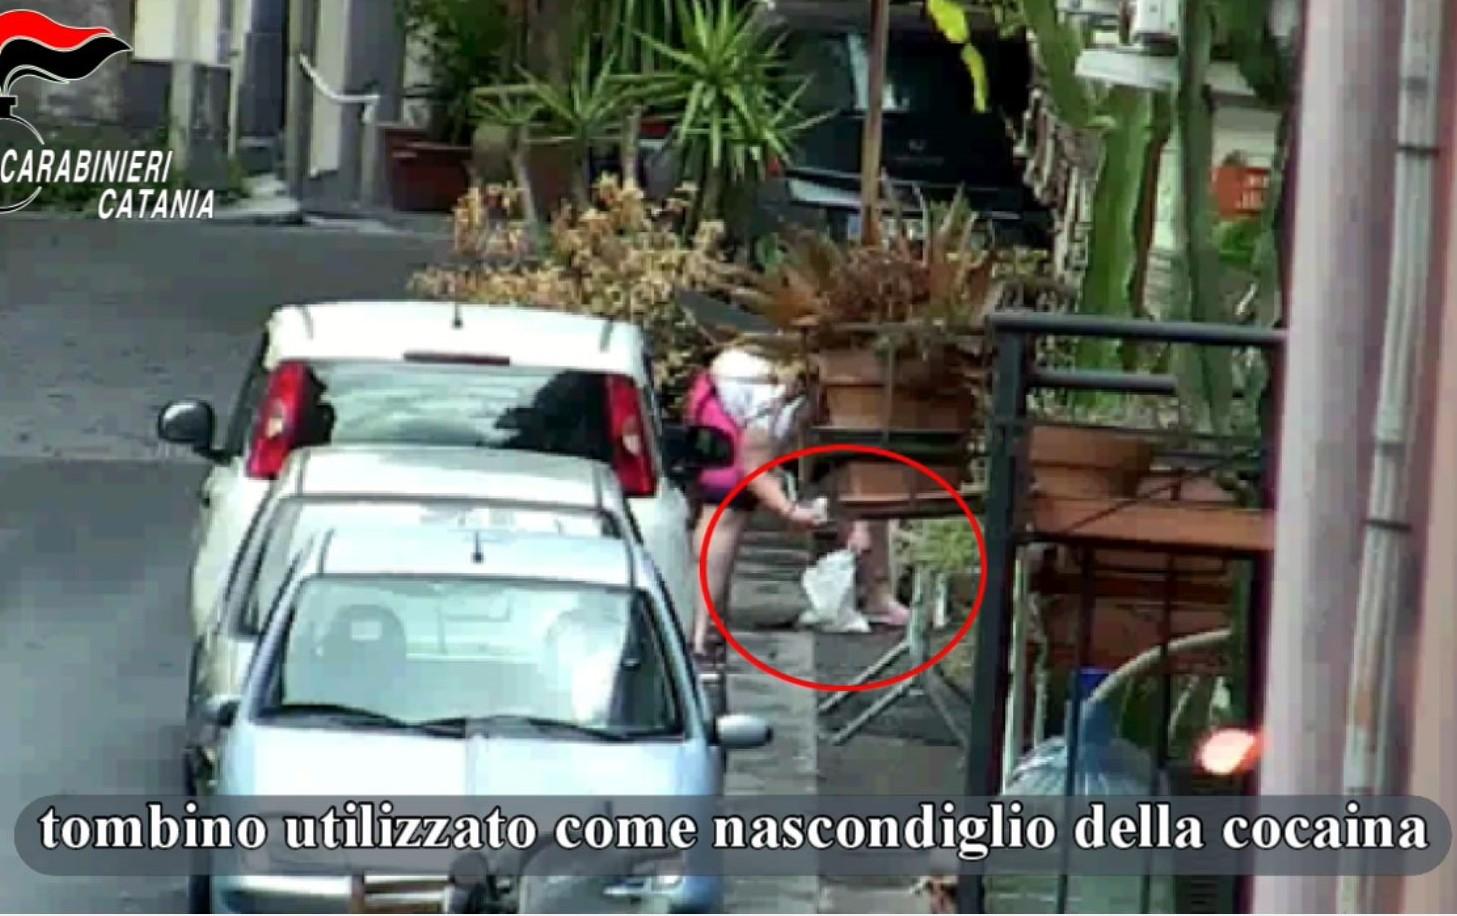 Bimbi di 10 anni utilizzati per spacciare, 20 arresti a Catania